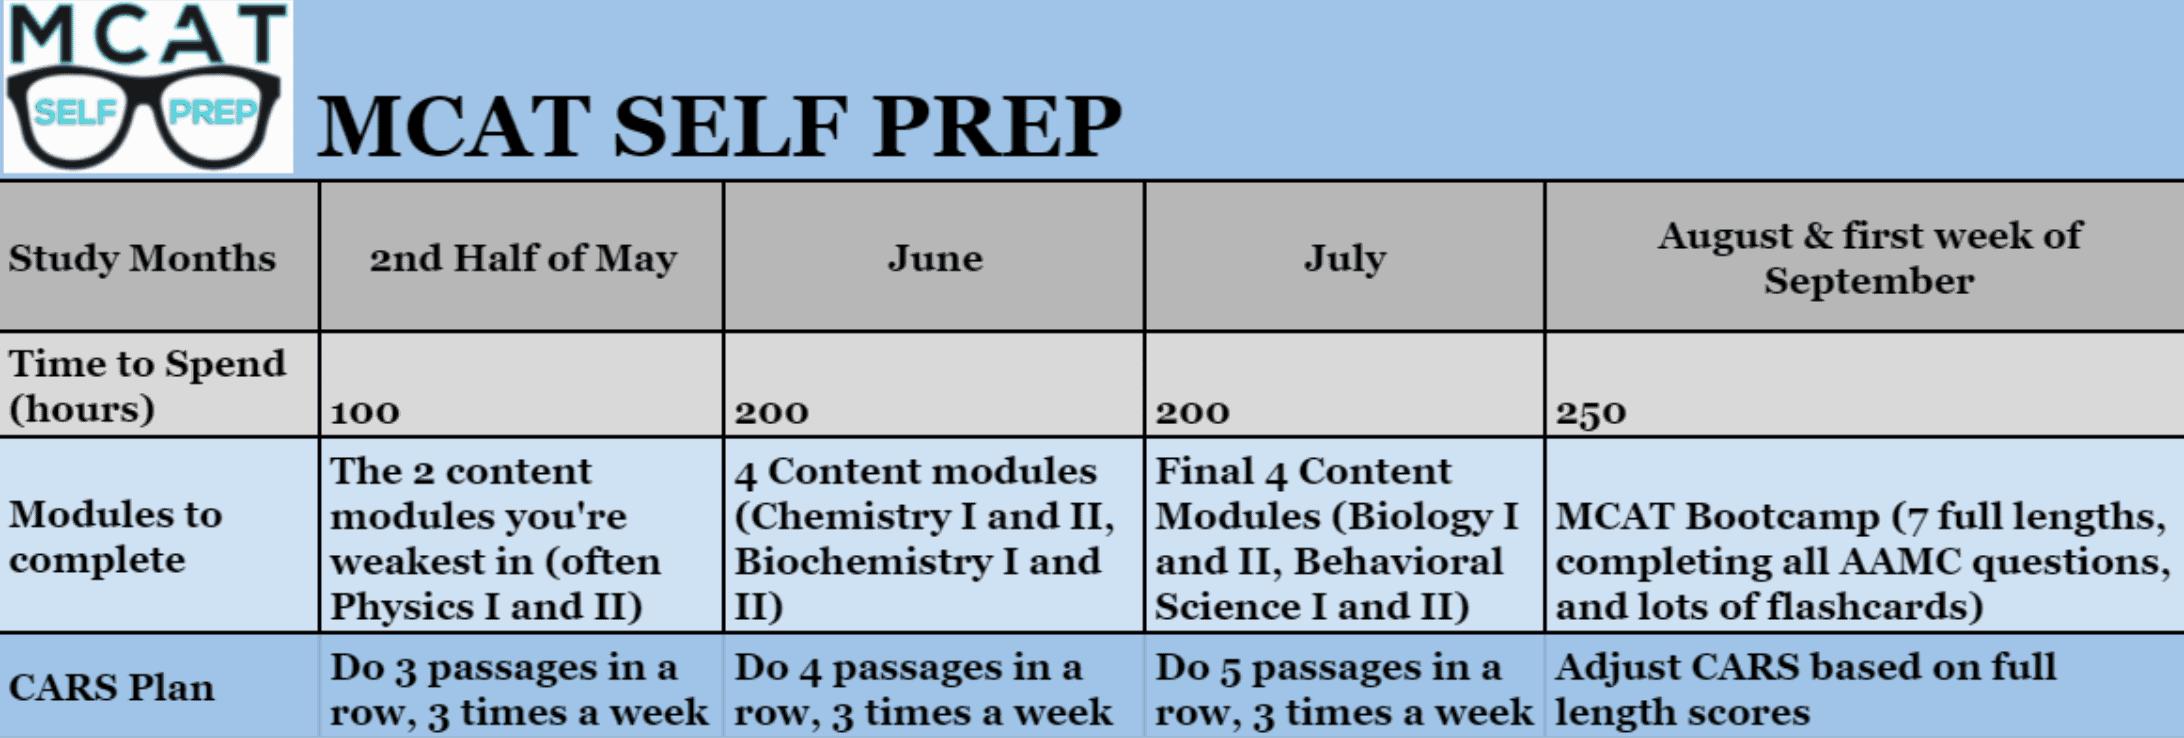 MCAT Study Schedule 3 months - MCAT Prep Course